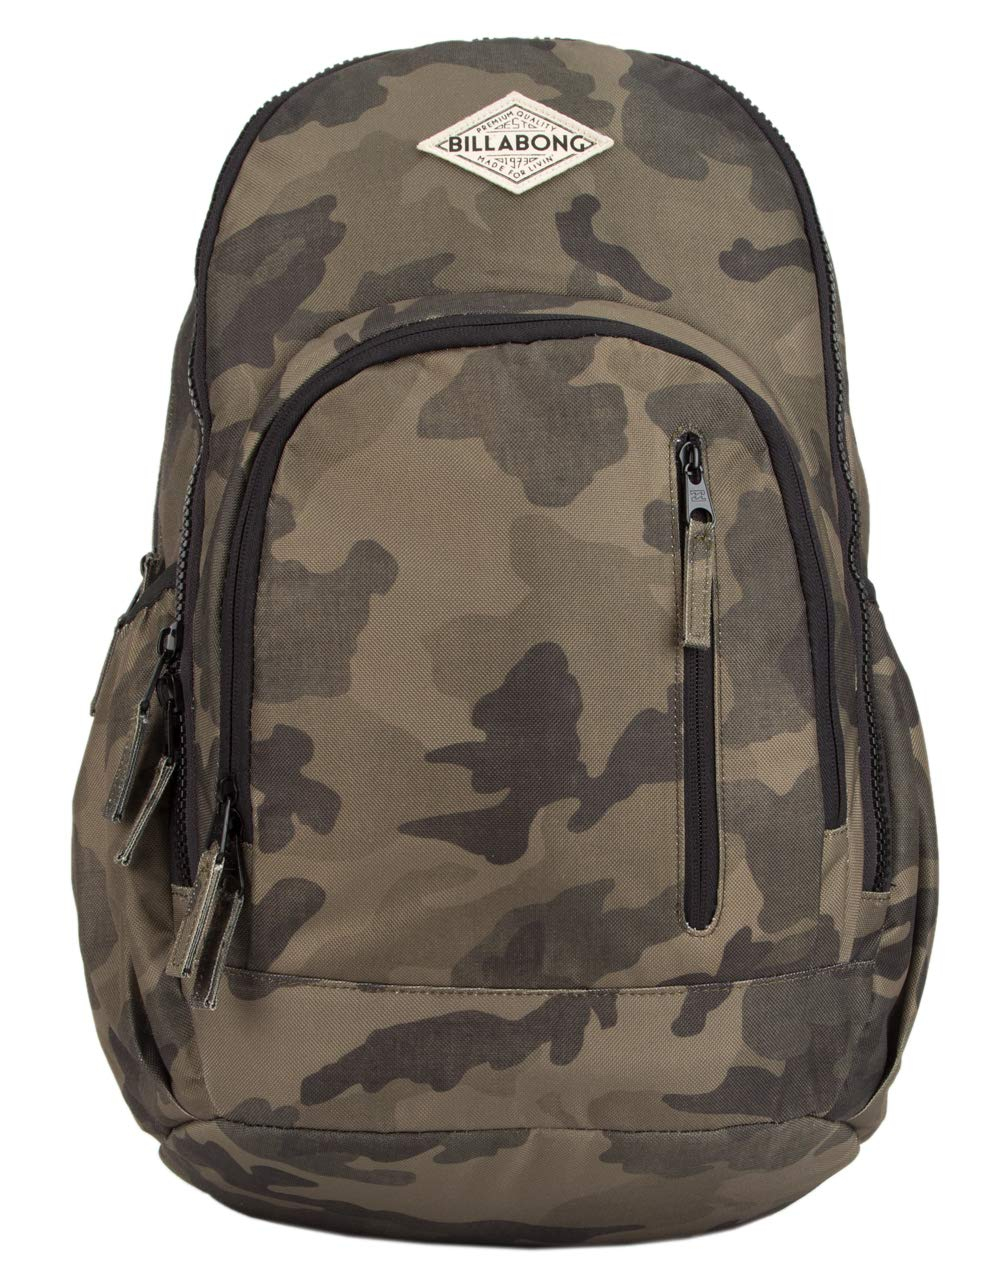 Billabong Women's Roadie Backpack Camo One Size by Billabong